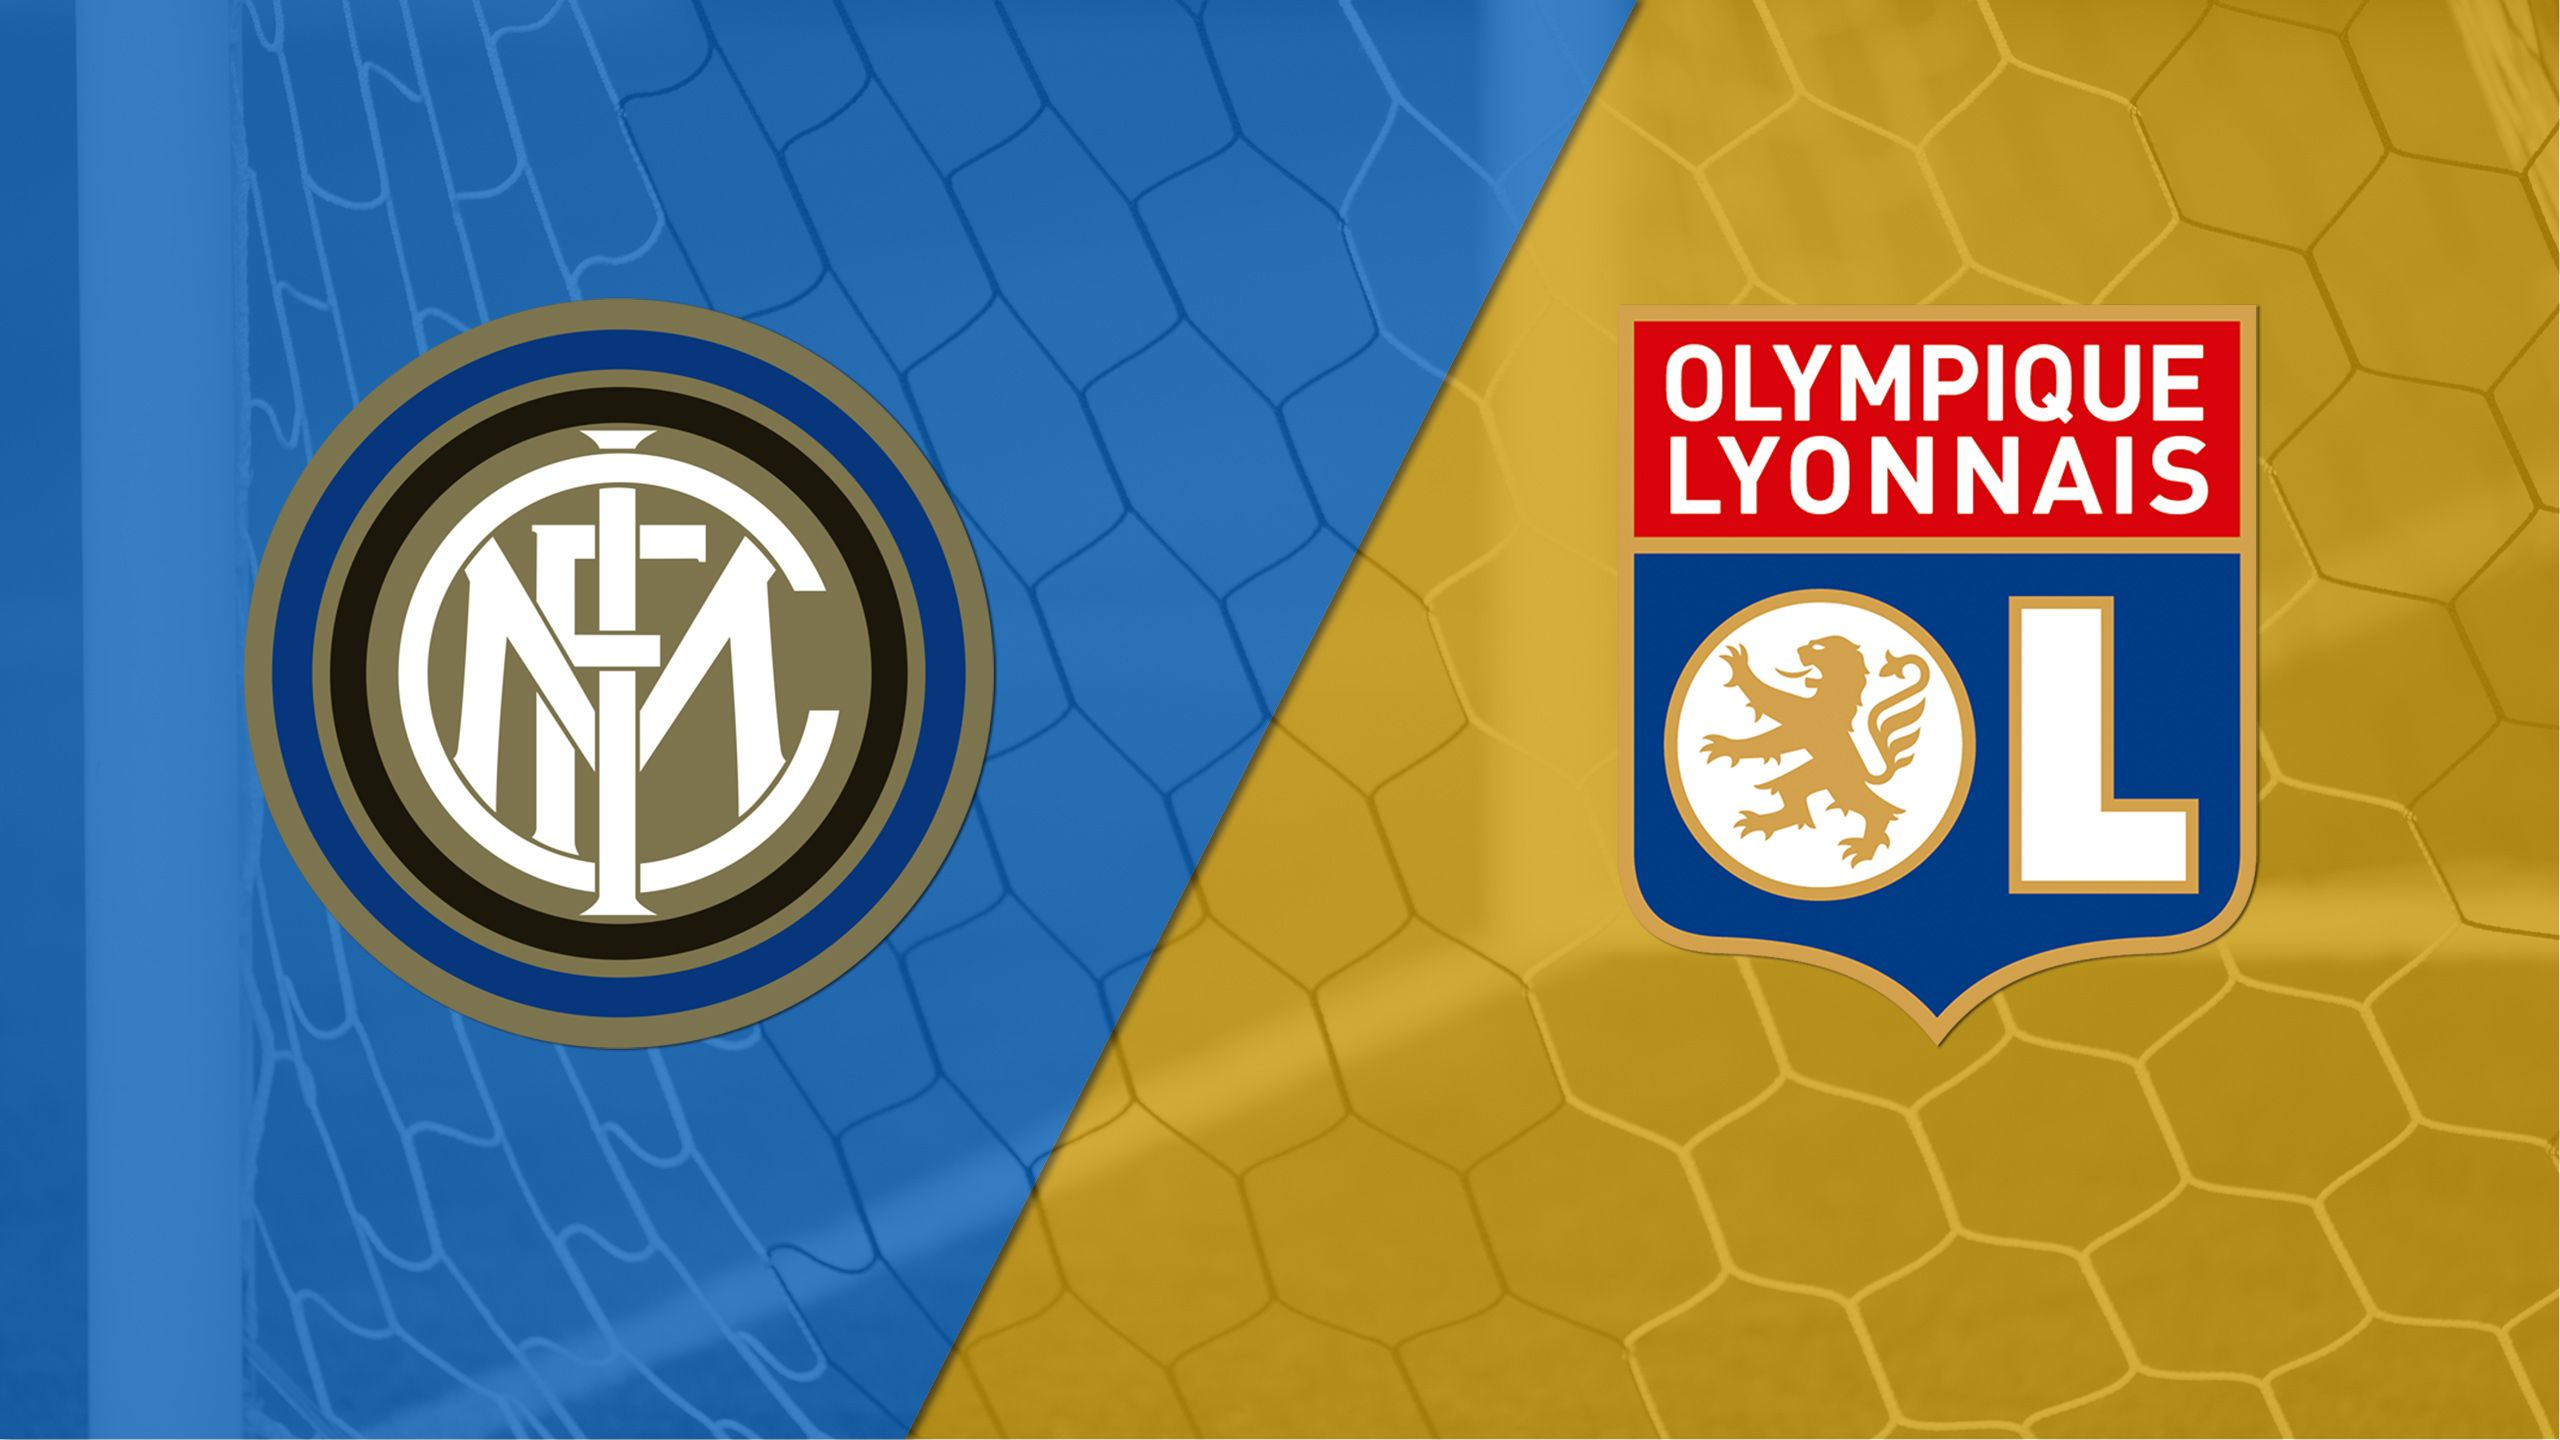 Internazionale vs. Olympique Lyonnais (International Champions Cup)